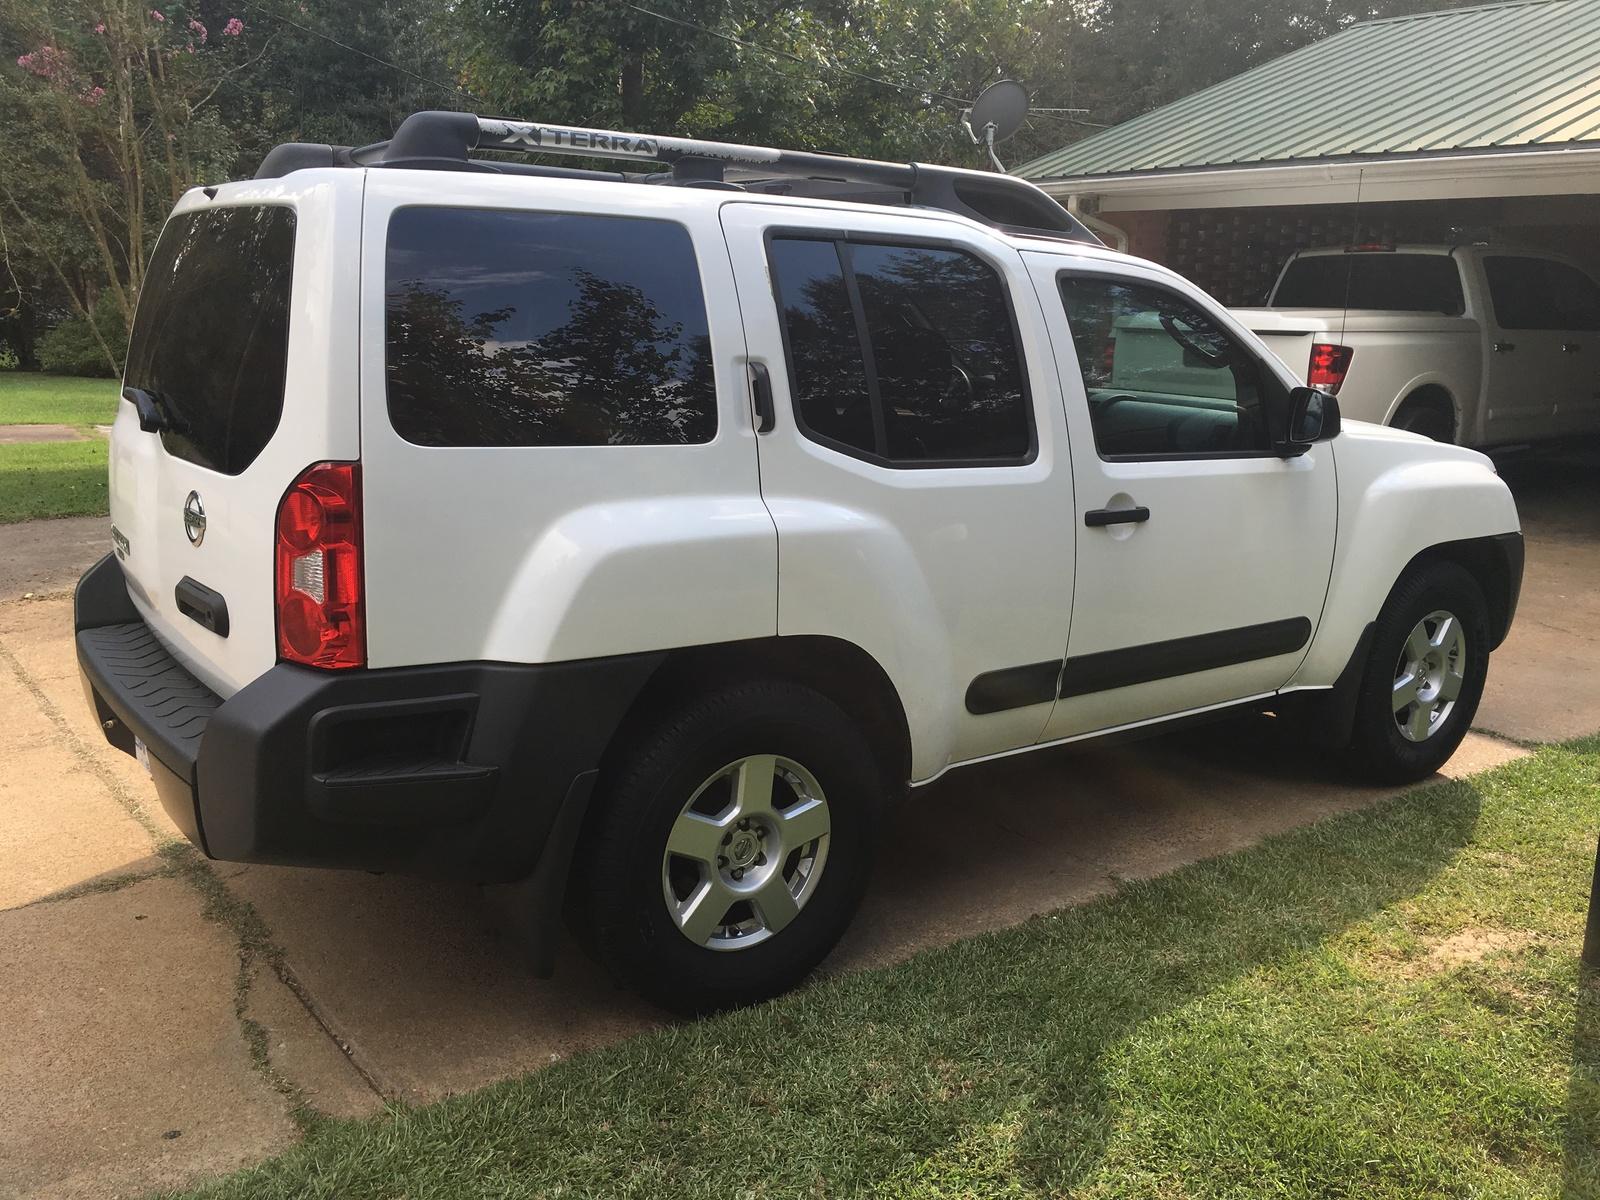 2006 jeep liberty - user reviews - cargurus